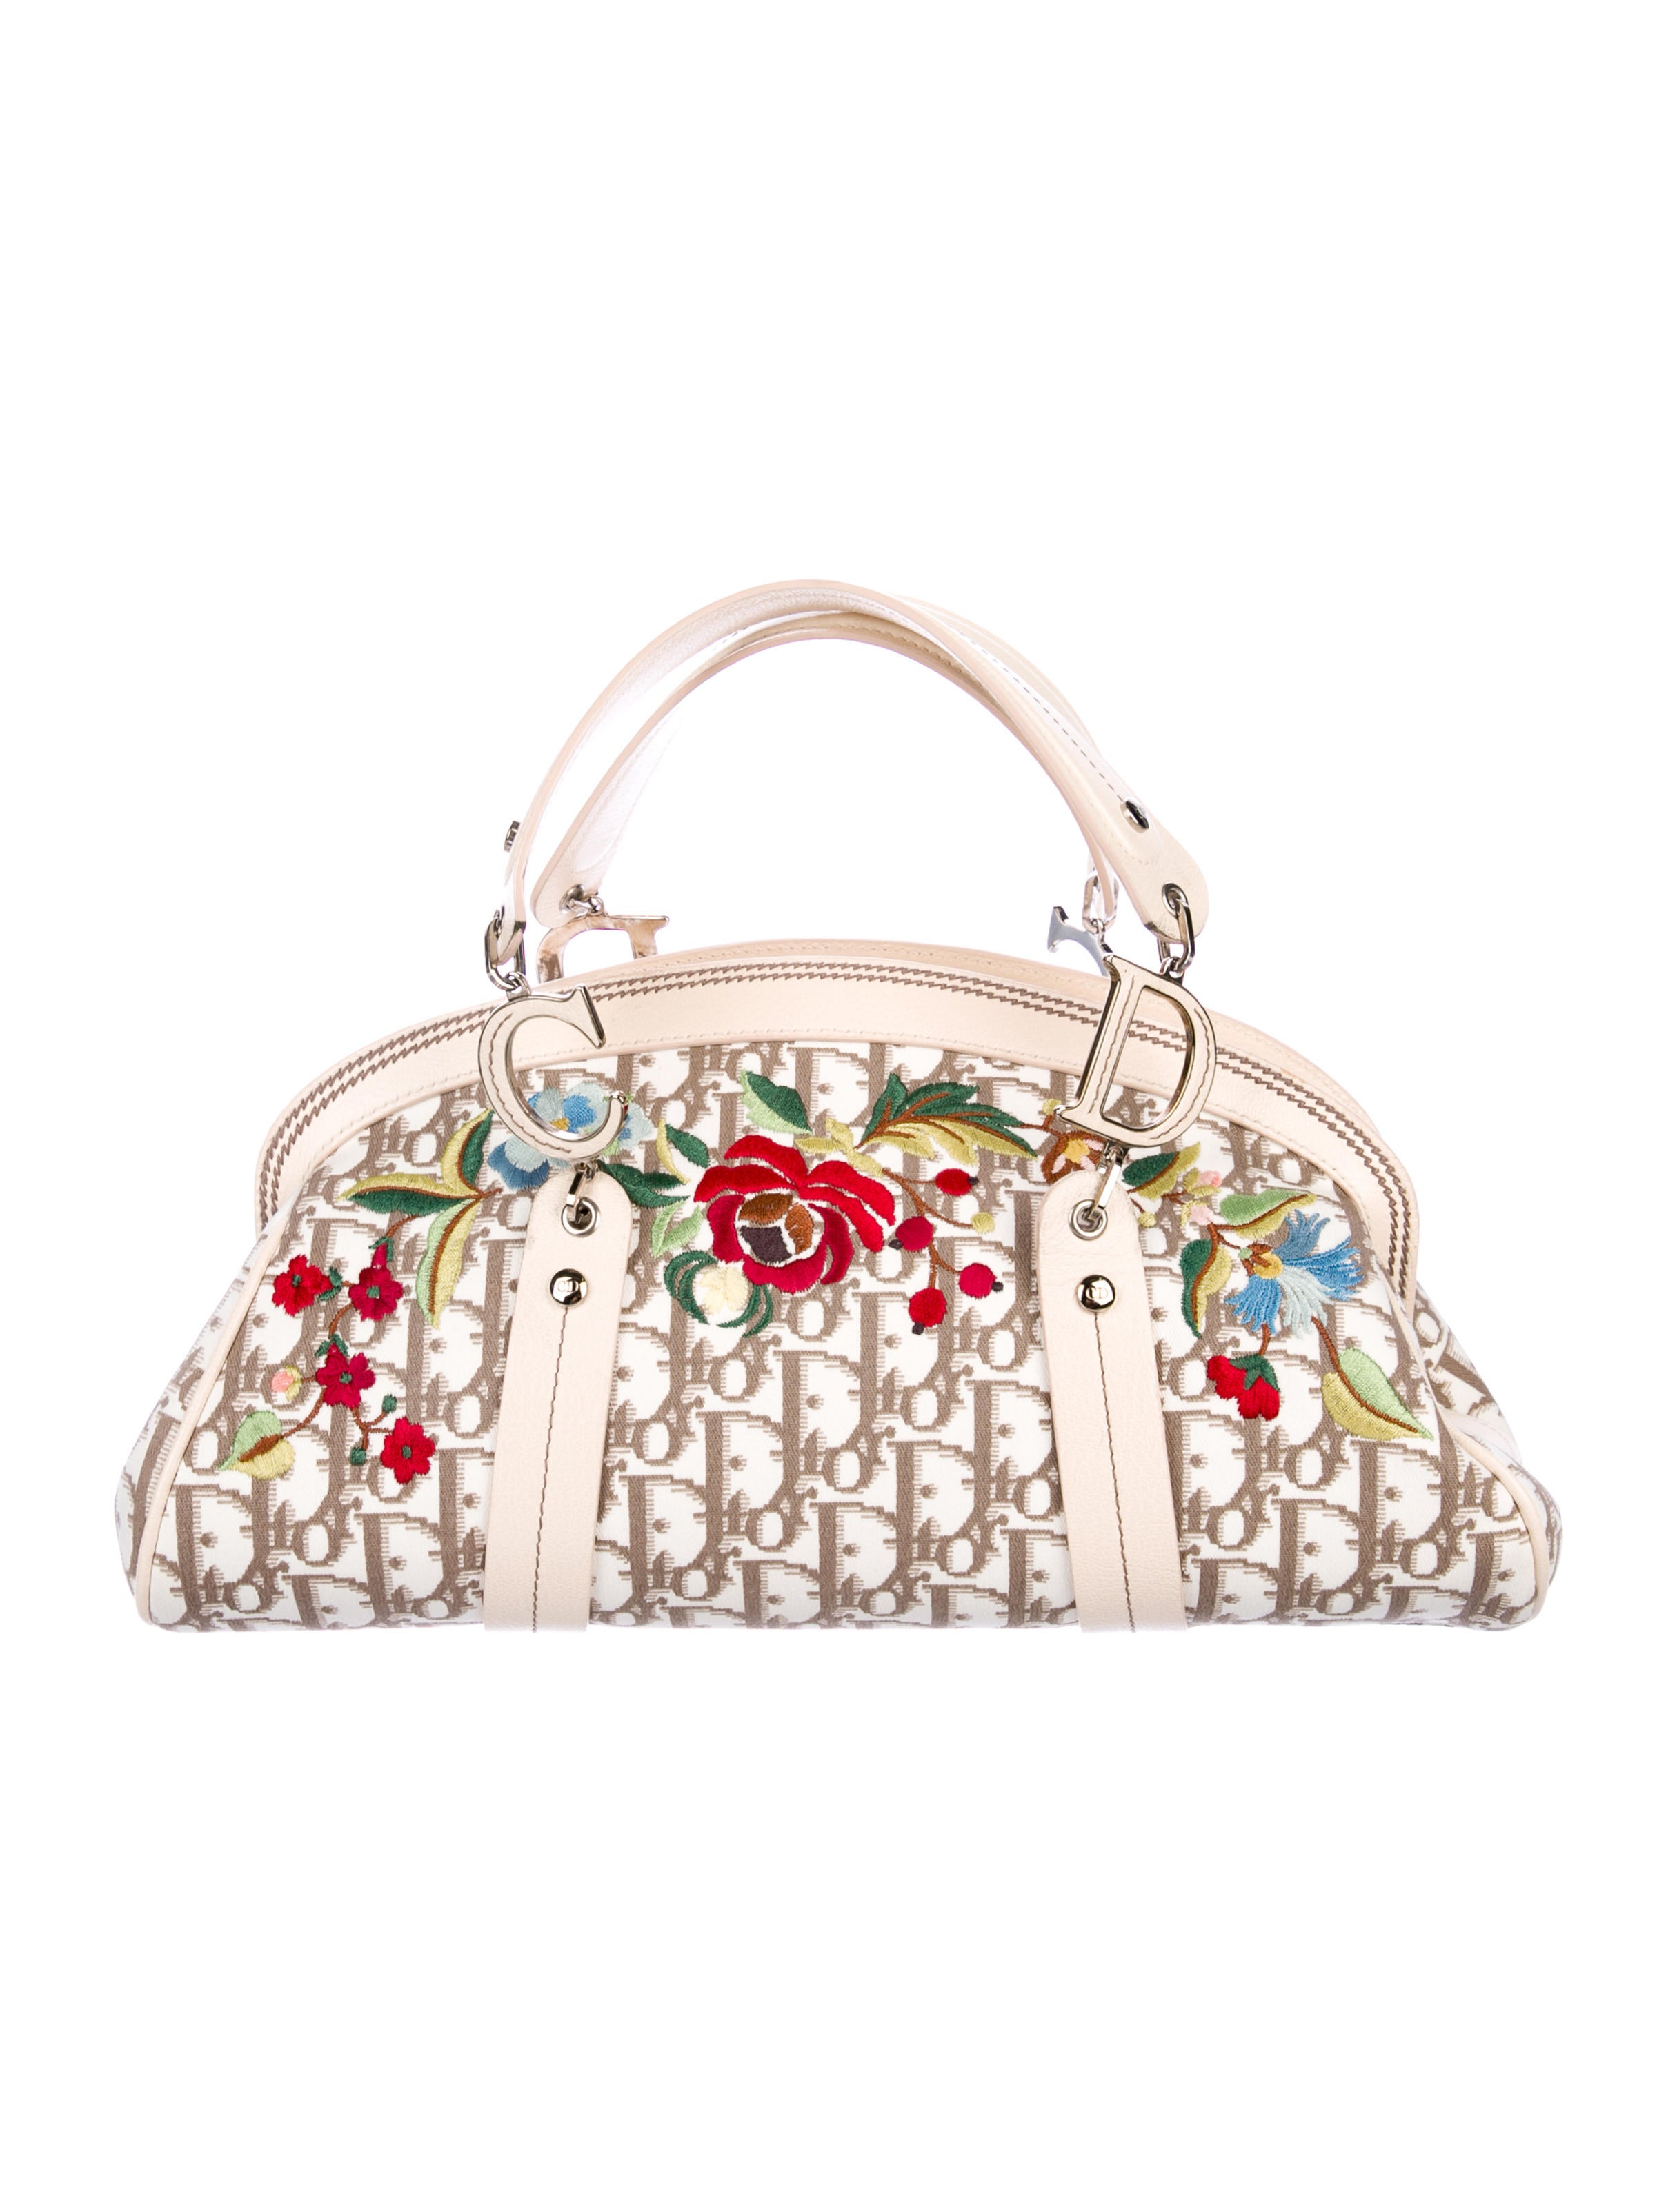 Vintage FlowersHandle Bag by Christian Dior